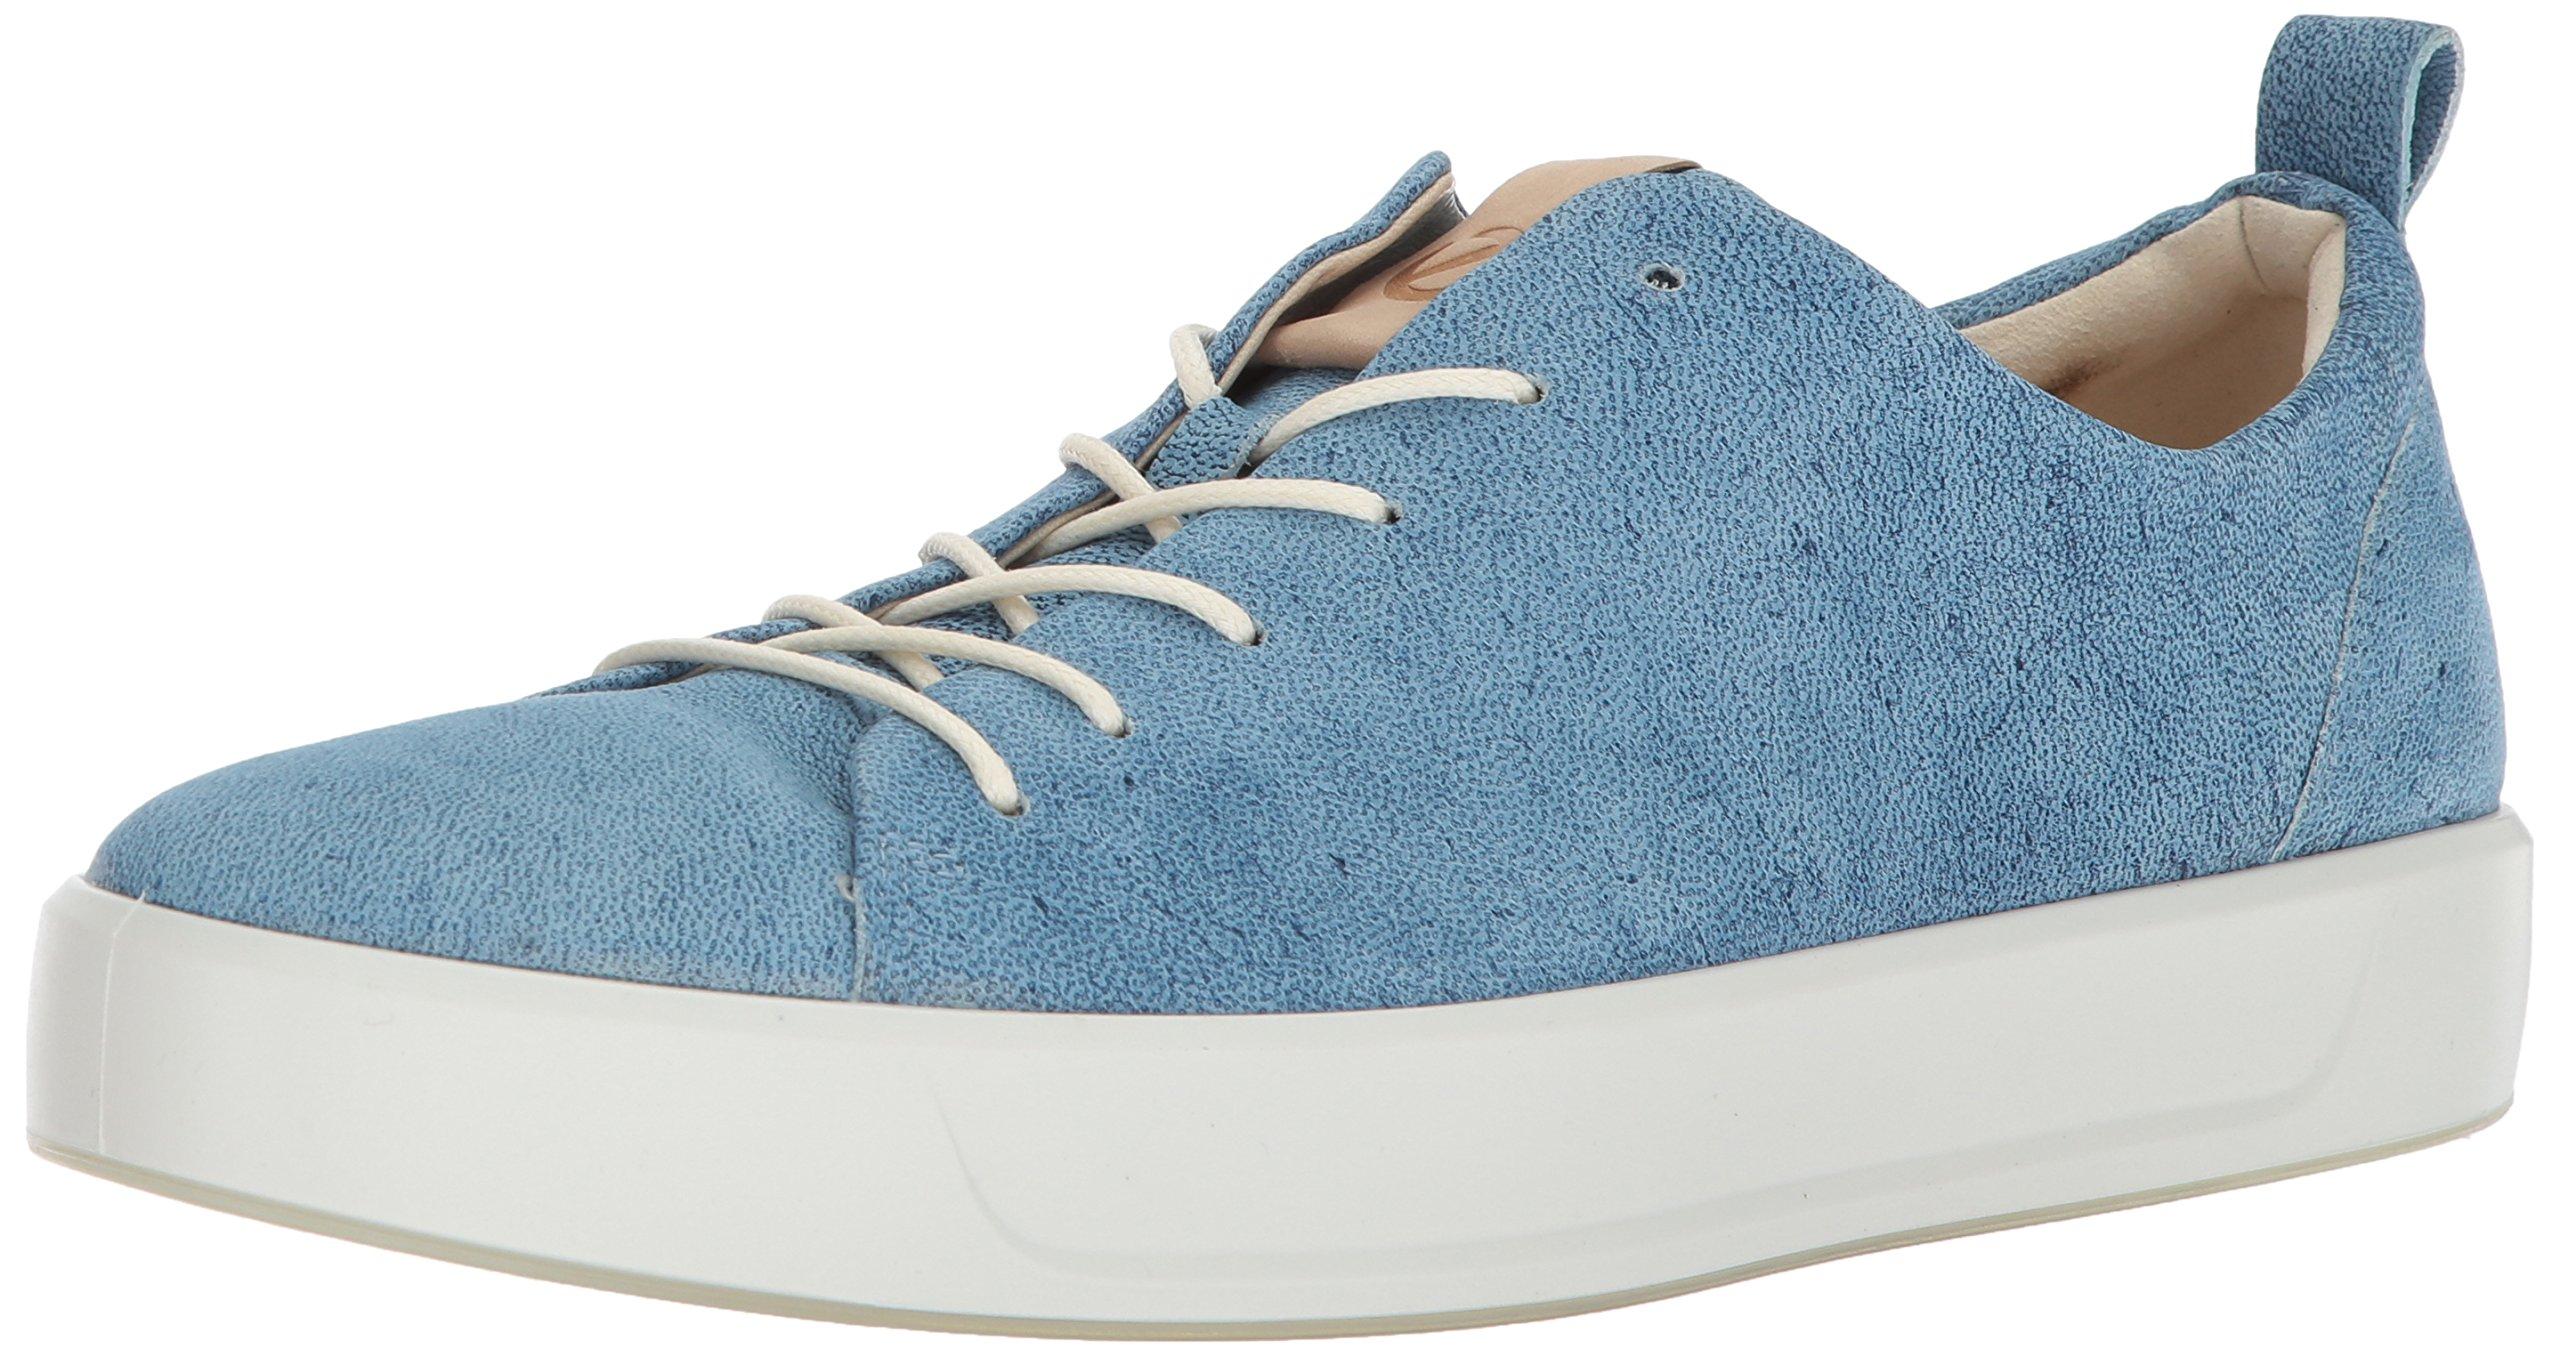 ECCO Men's Soft 8 Tie Fashion Sneaker, Indigo Powder, 8-8.5 M US